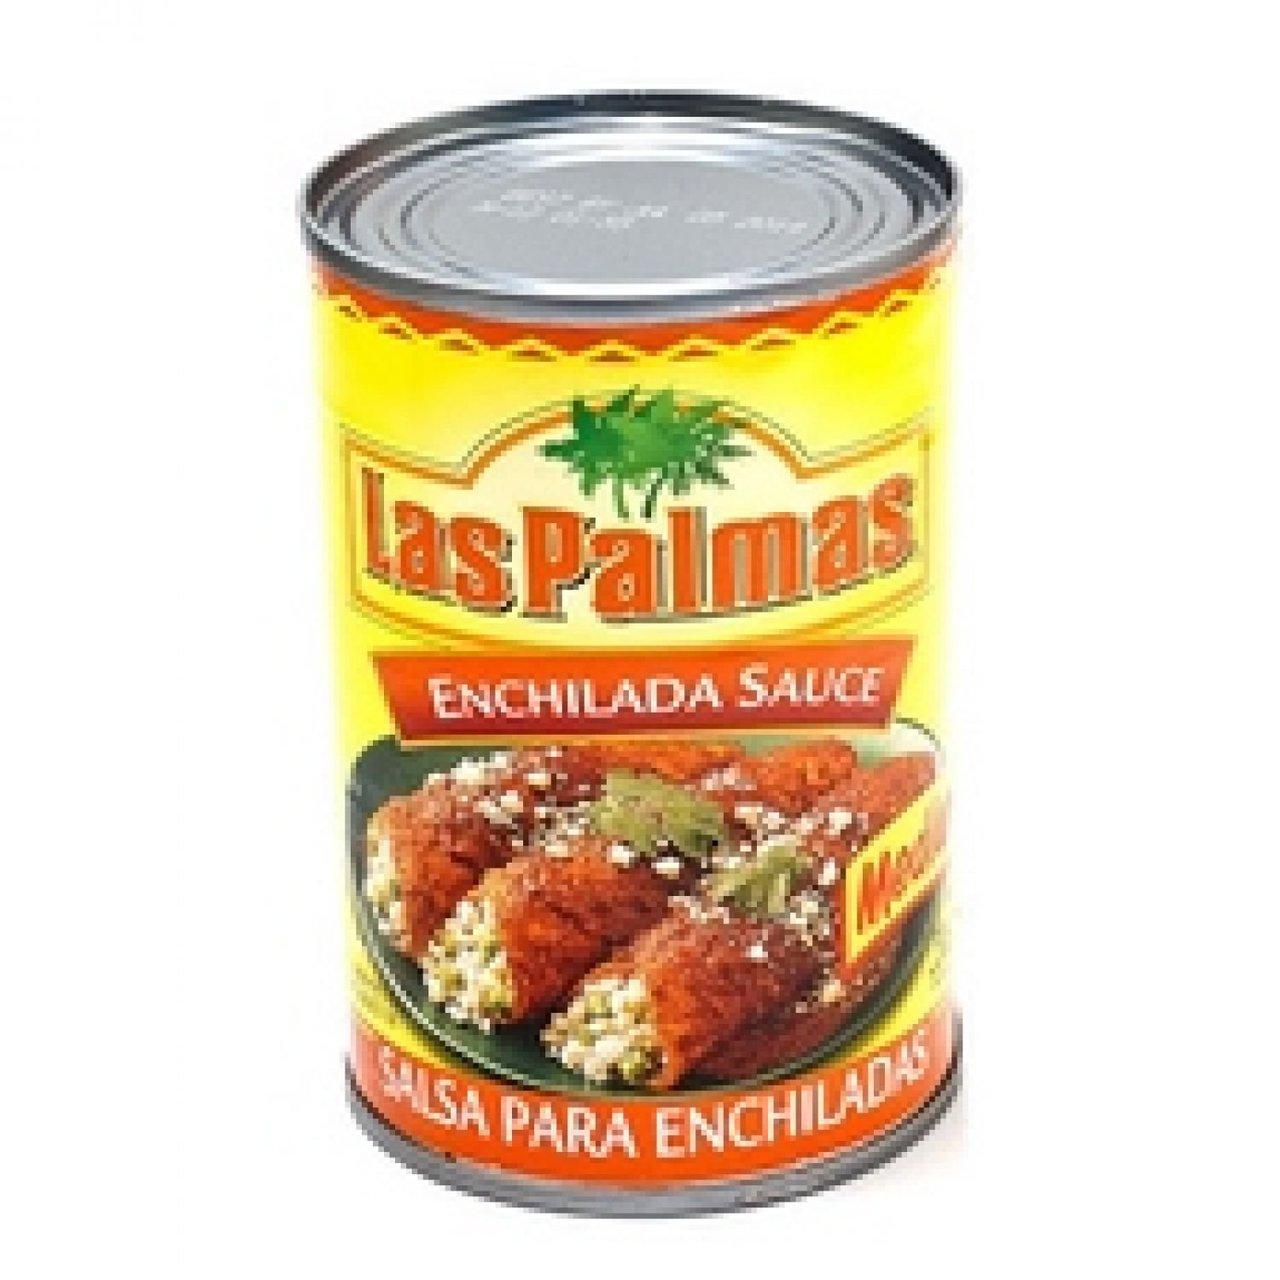 12 PACKS : Enchilada Sauce Mild by Las Palmas, 28 oz